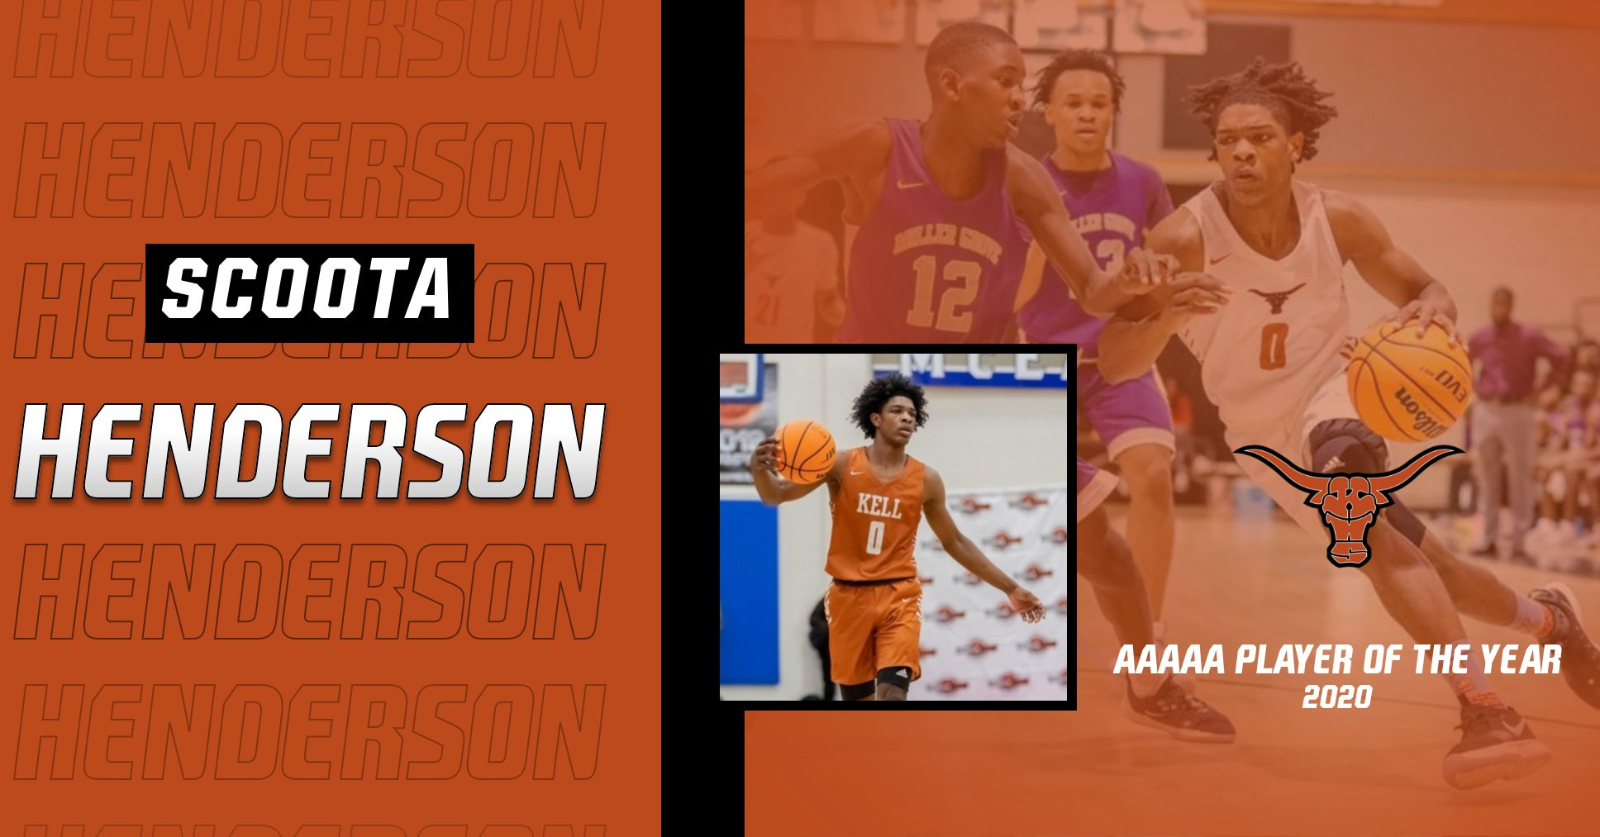 Congrats Scoota Henderson